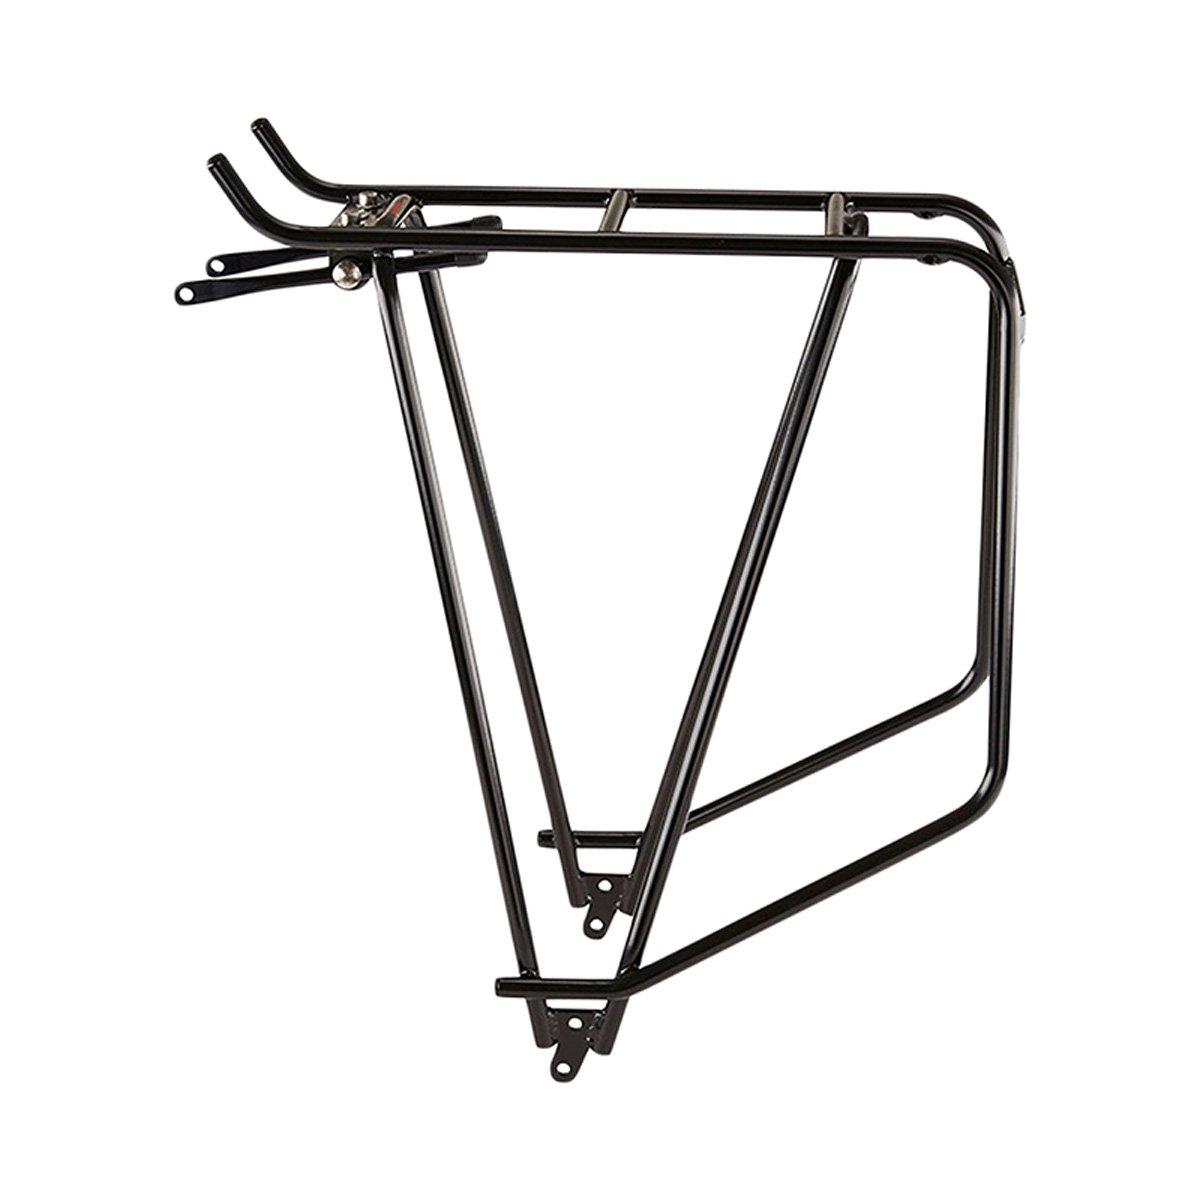 /Cargo Tubus Carrier Cargo 26/28/Inch Black Silver Rear Cycling Bicycle Bike Rear Rack Bag/